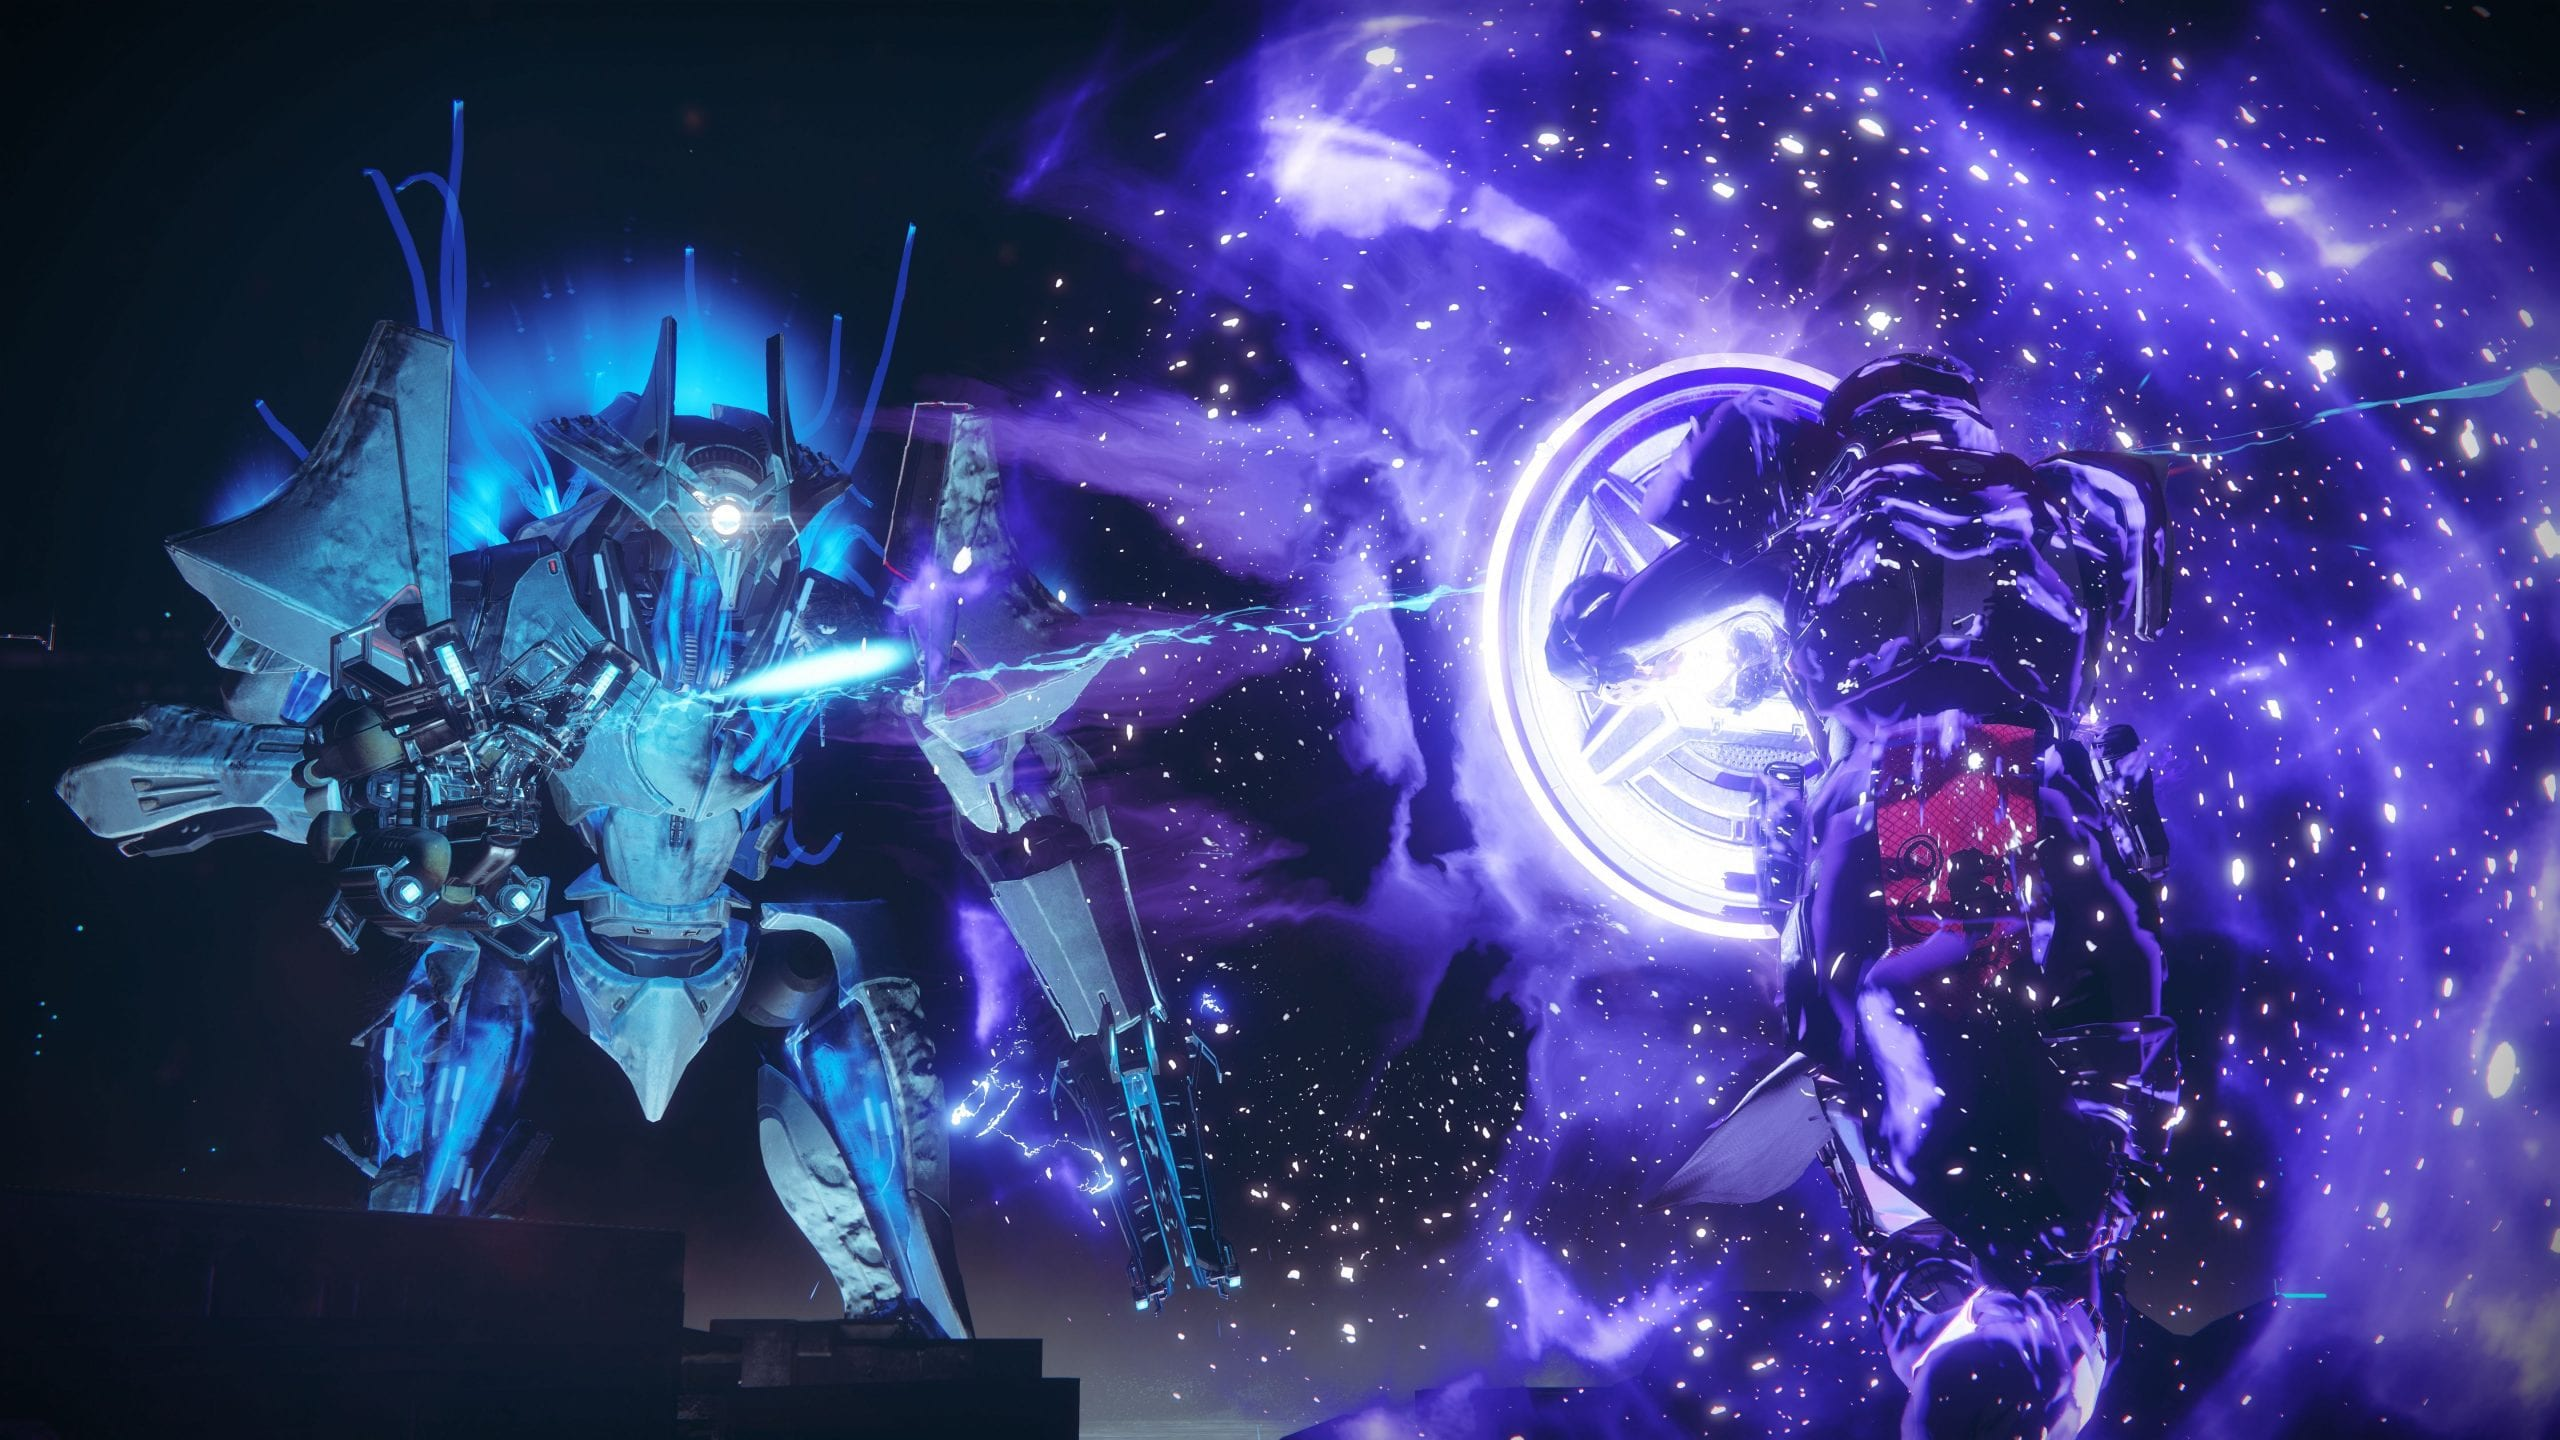 What's Next for 'Destiny 2'? - Armor Customization, Cross